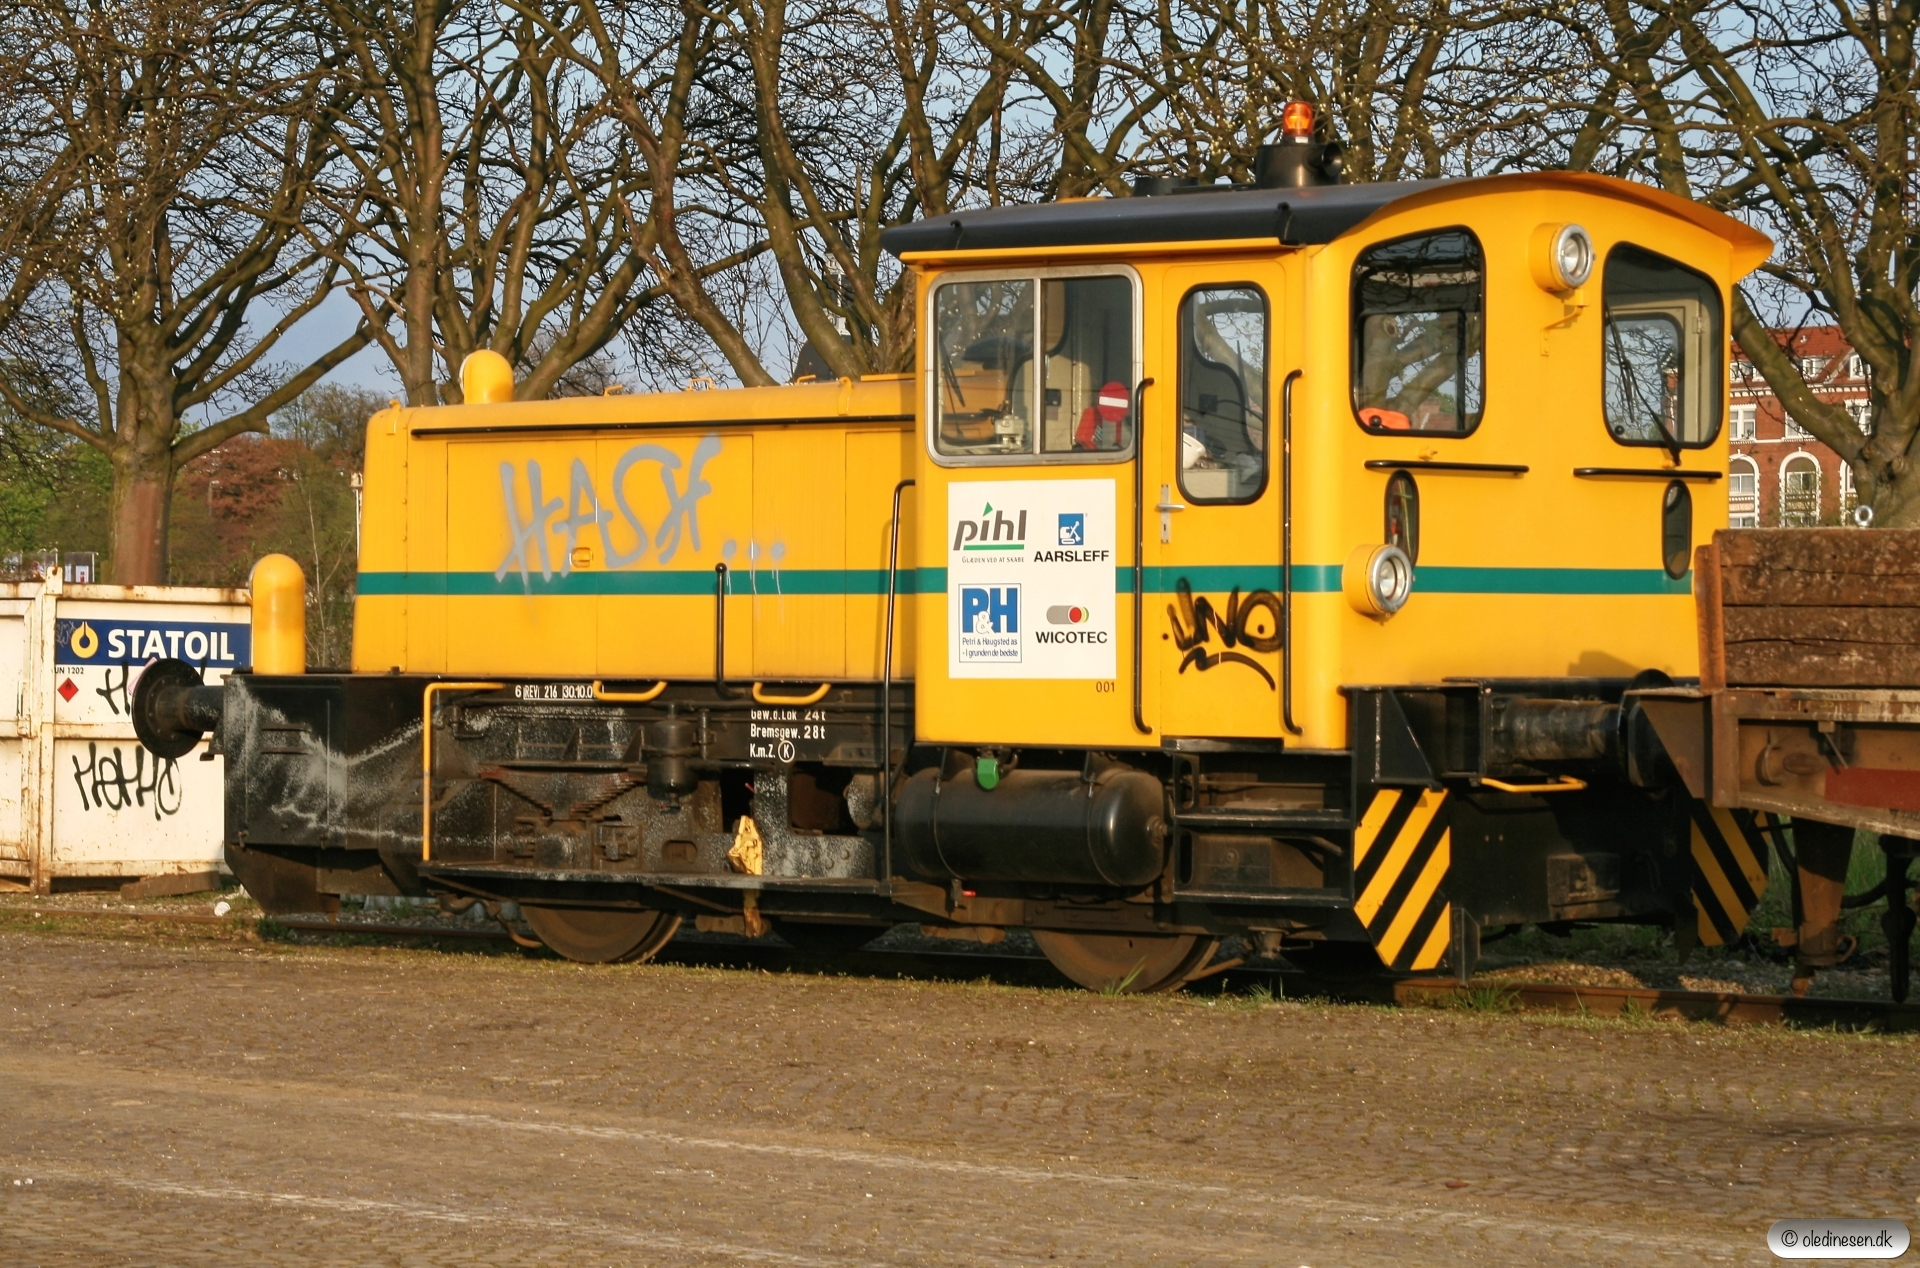 ARAIL Køf 001. Odense 23.04.2009.